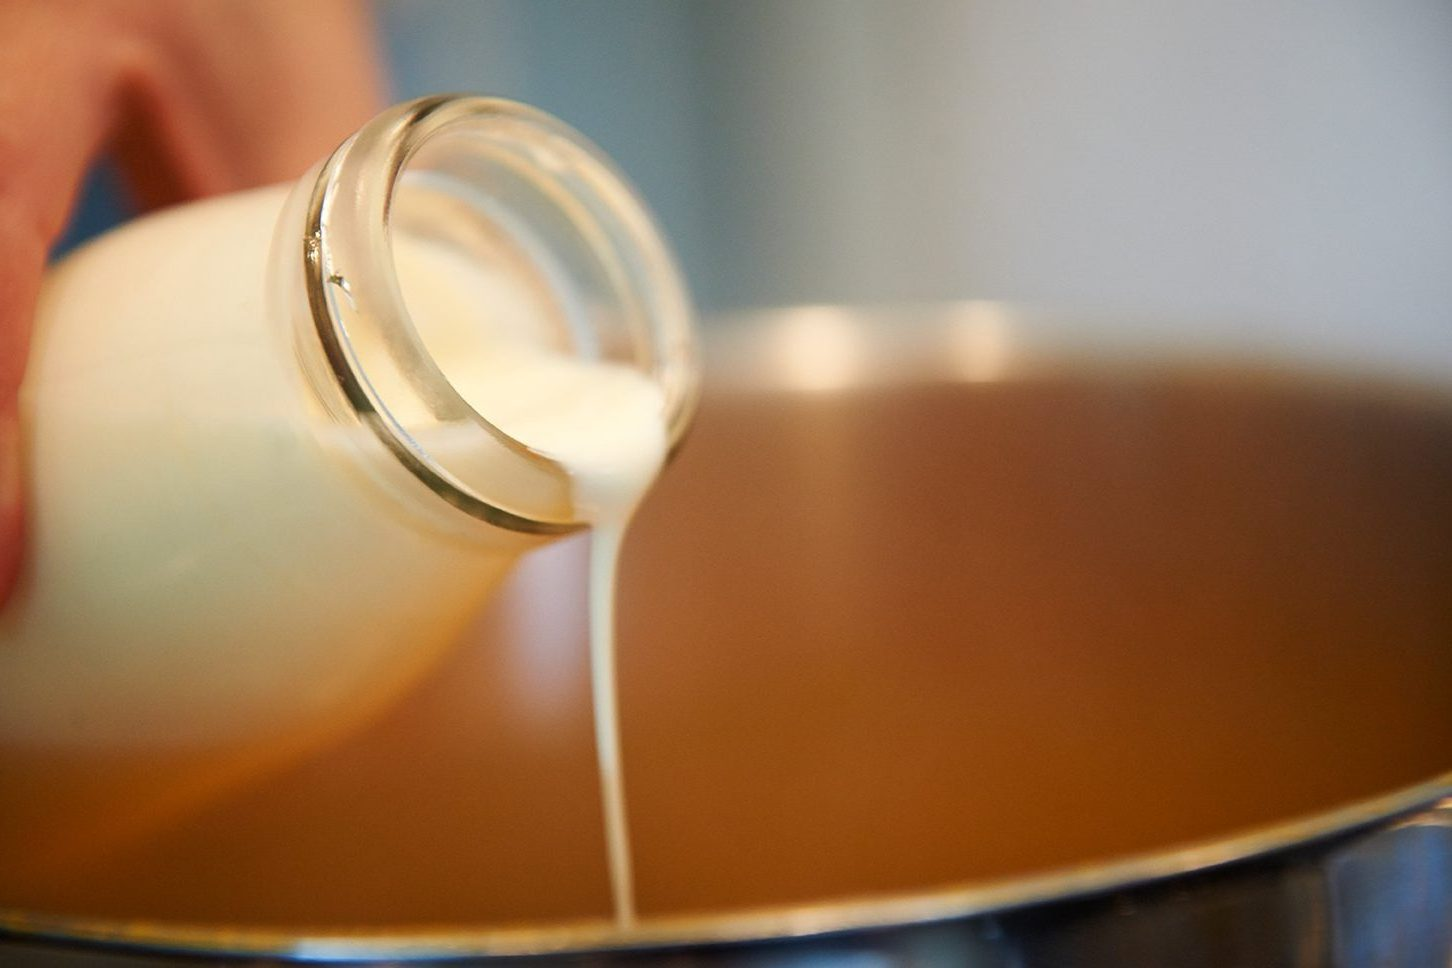 sahne-fuer-johannisbeer-joghurt-pancakes-mit-espresso-karamell-sosse-Foto: Maike-Helbig-fuer-www.myotherstories.de